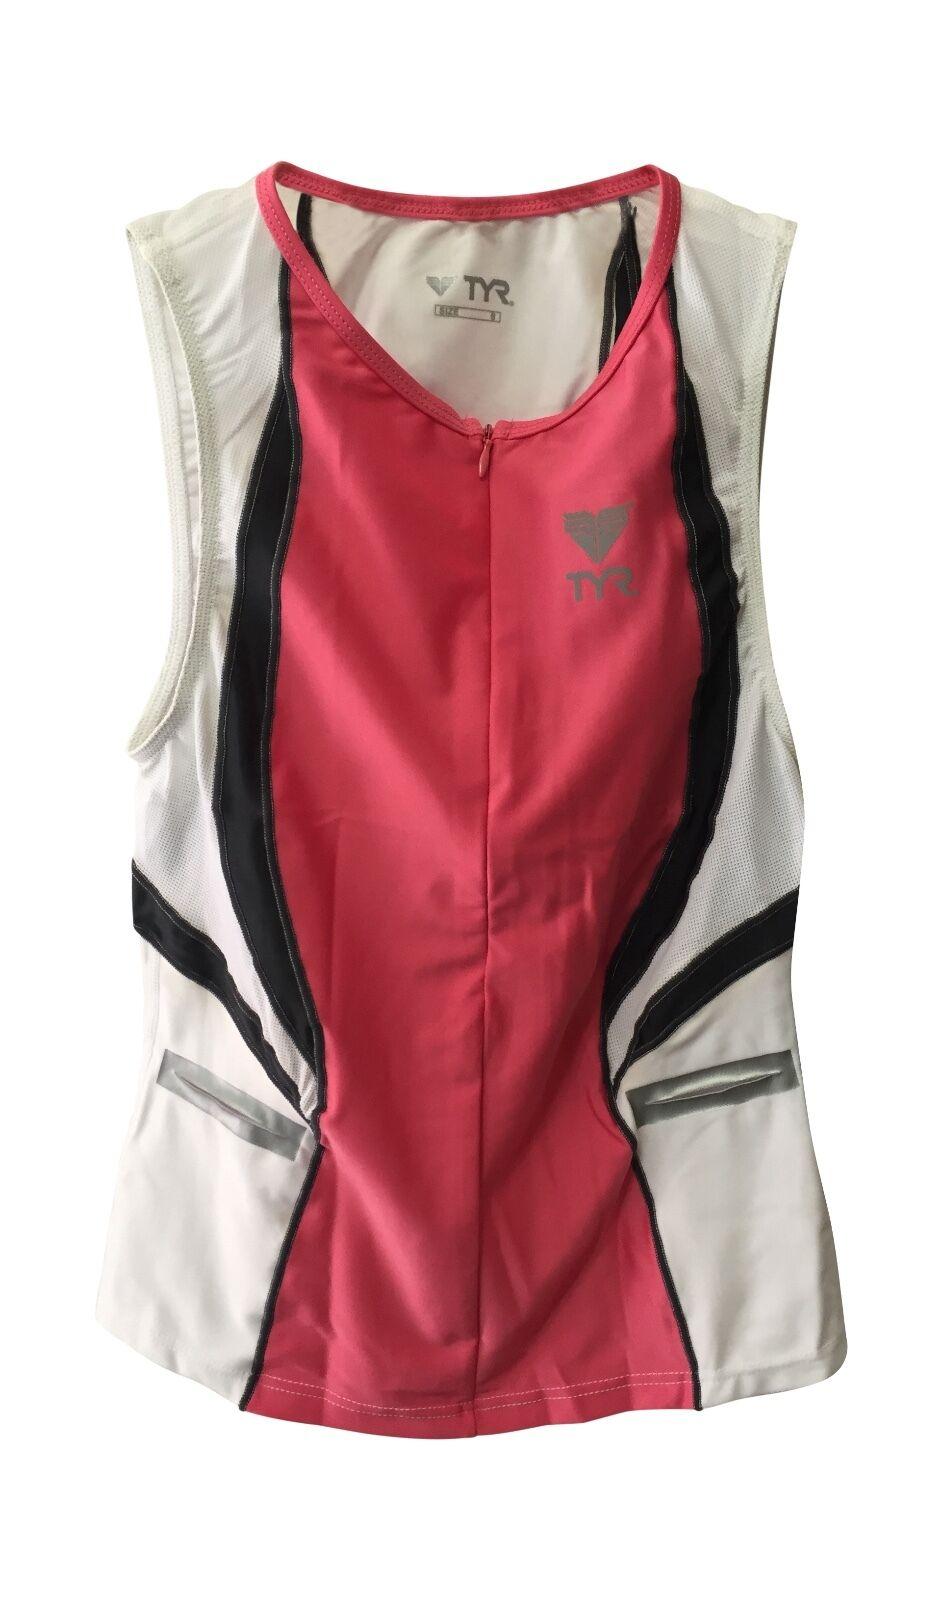 New TYR Splice Fem Singlet triathlon swimming biking running pink white top